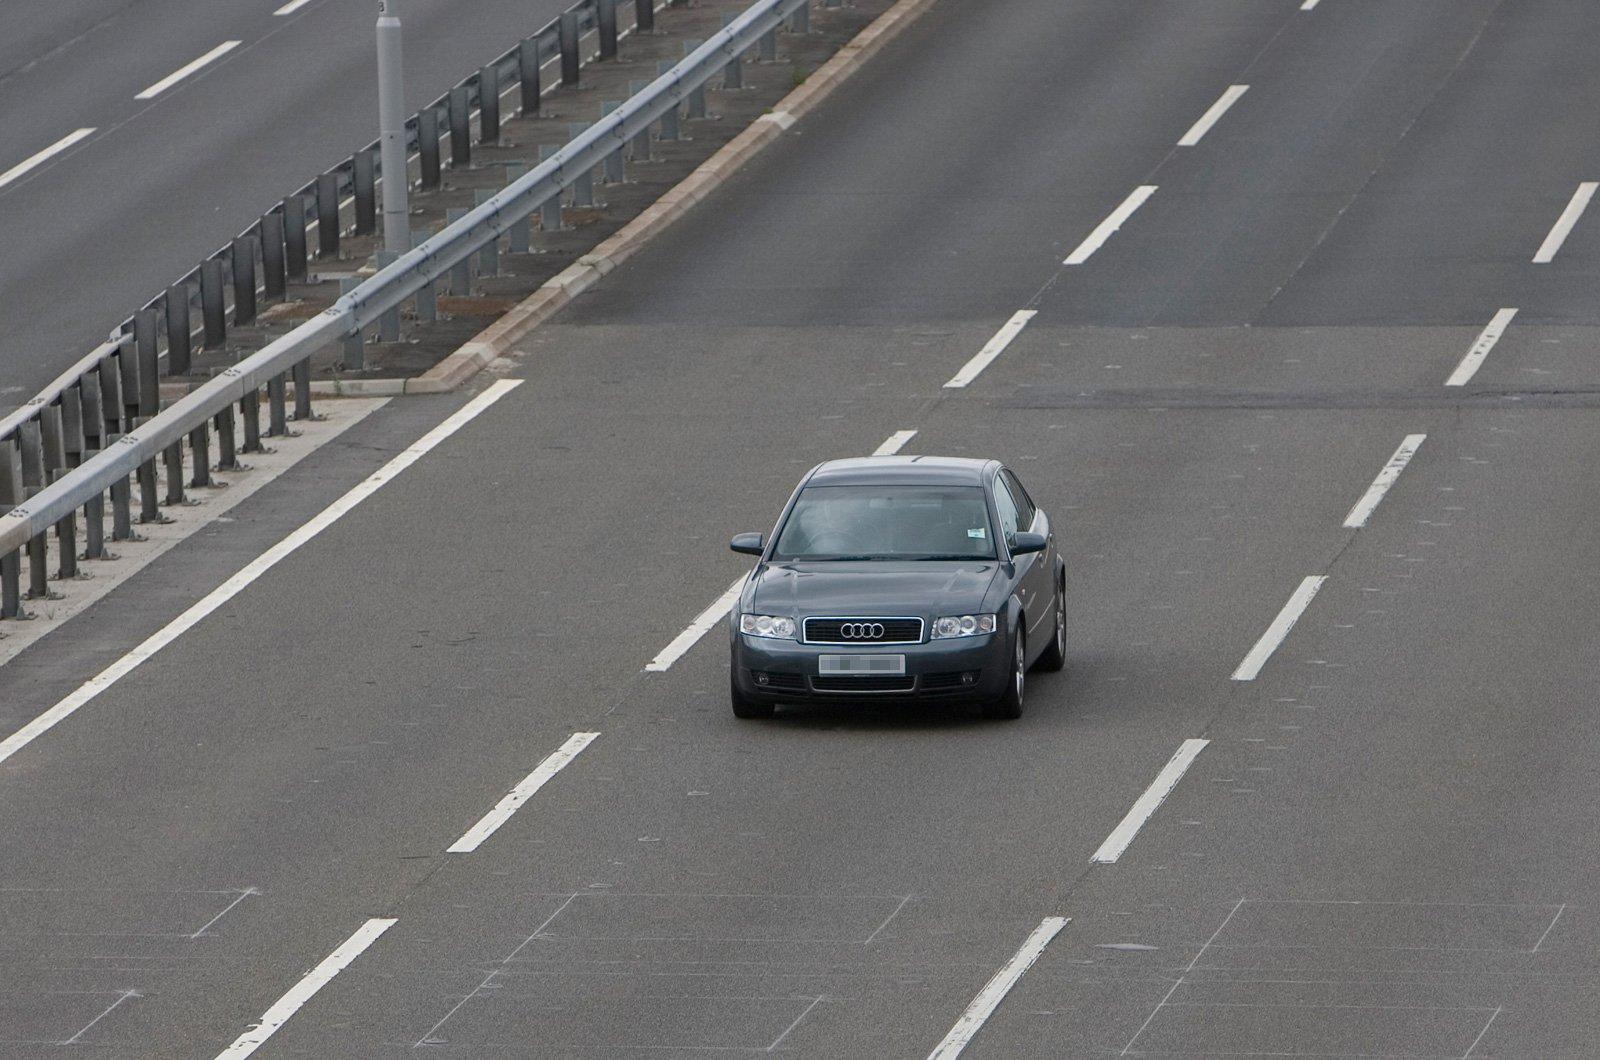 Middle-lane hogger